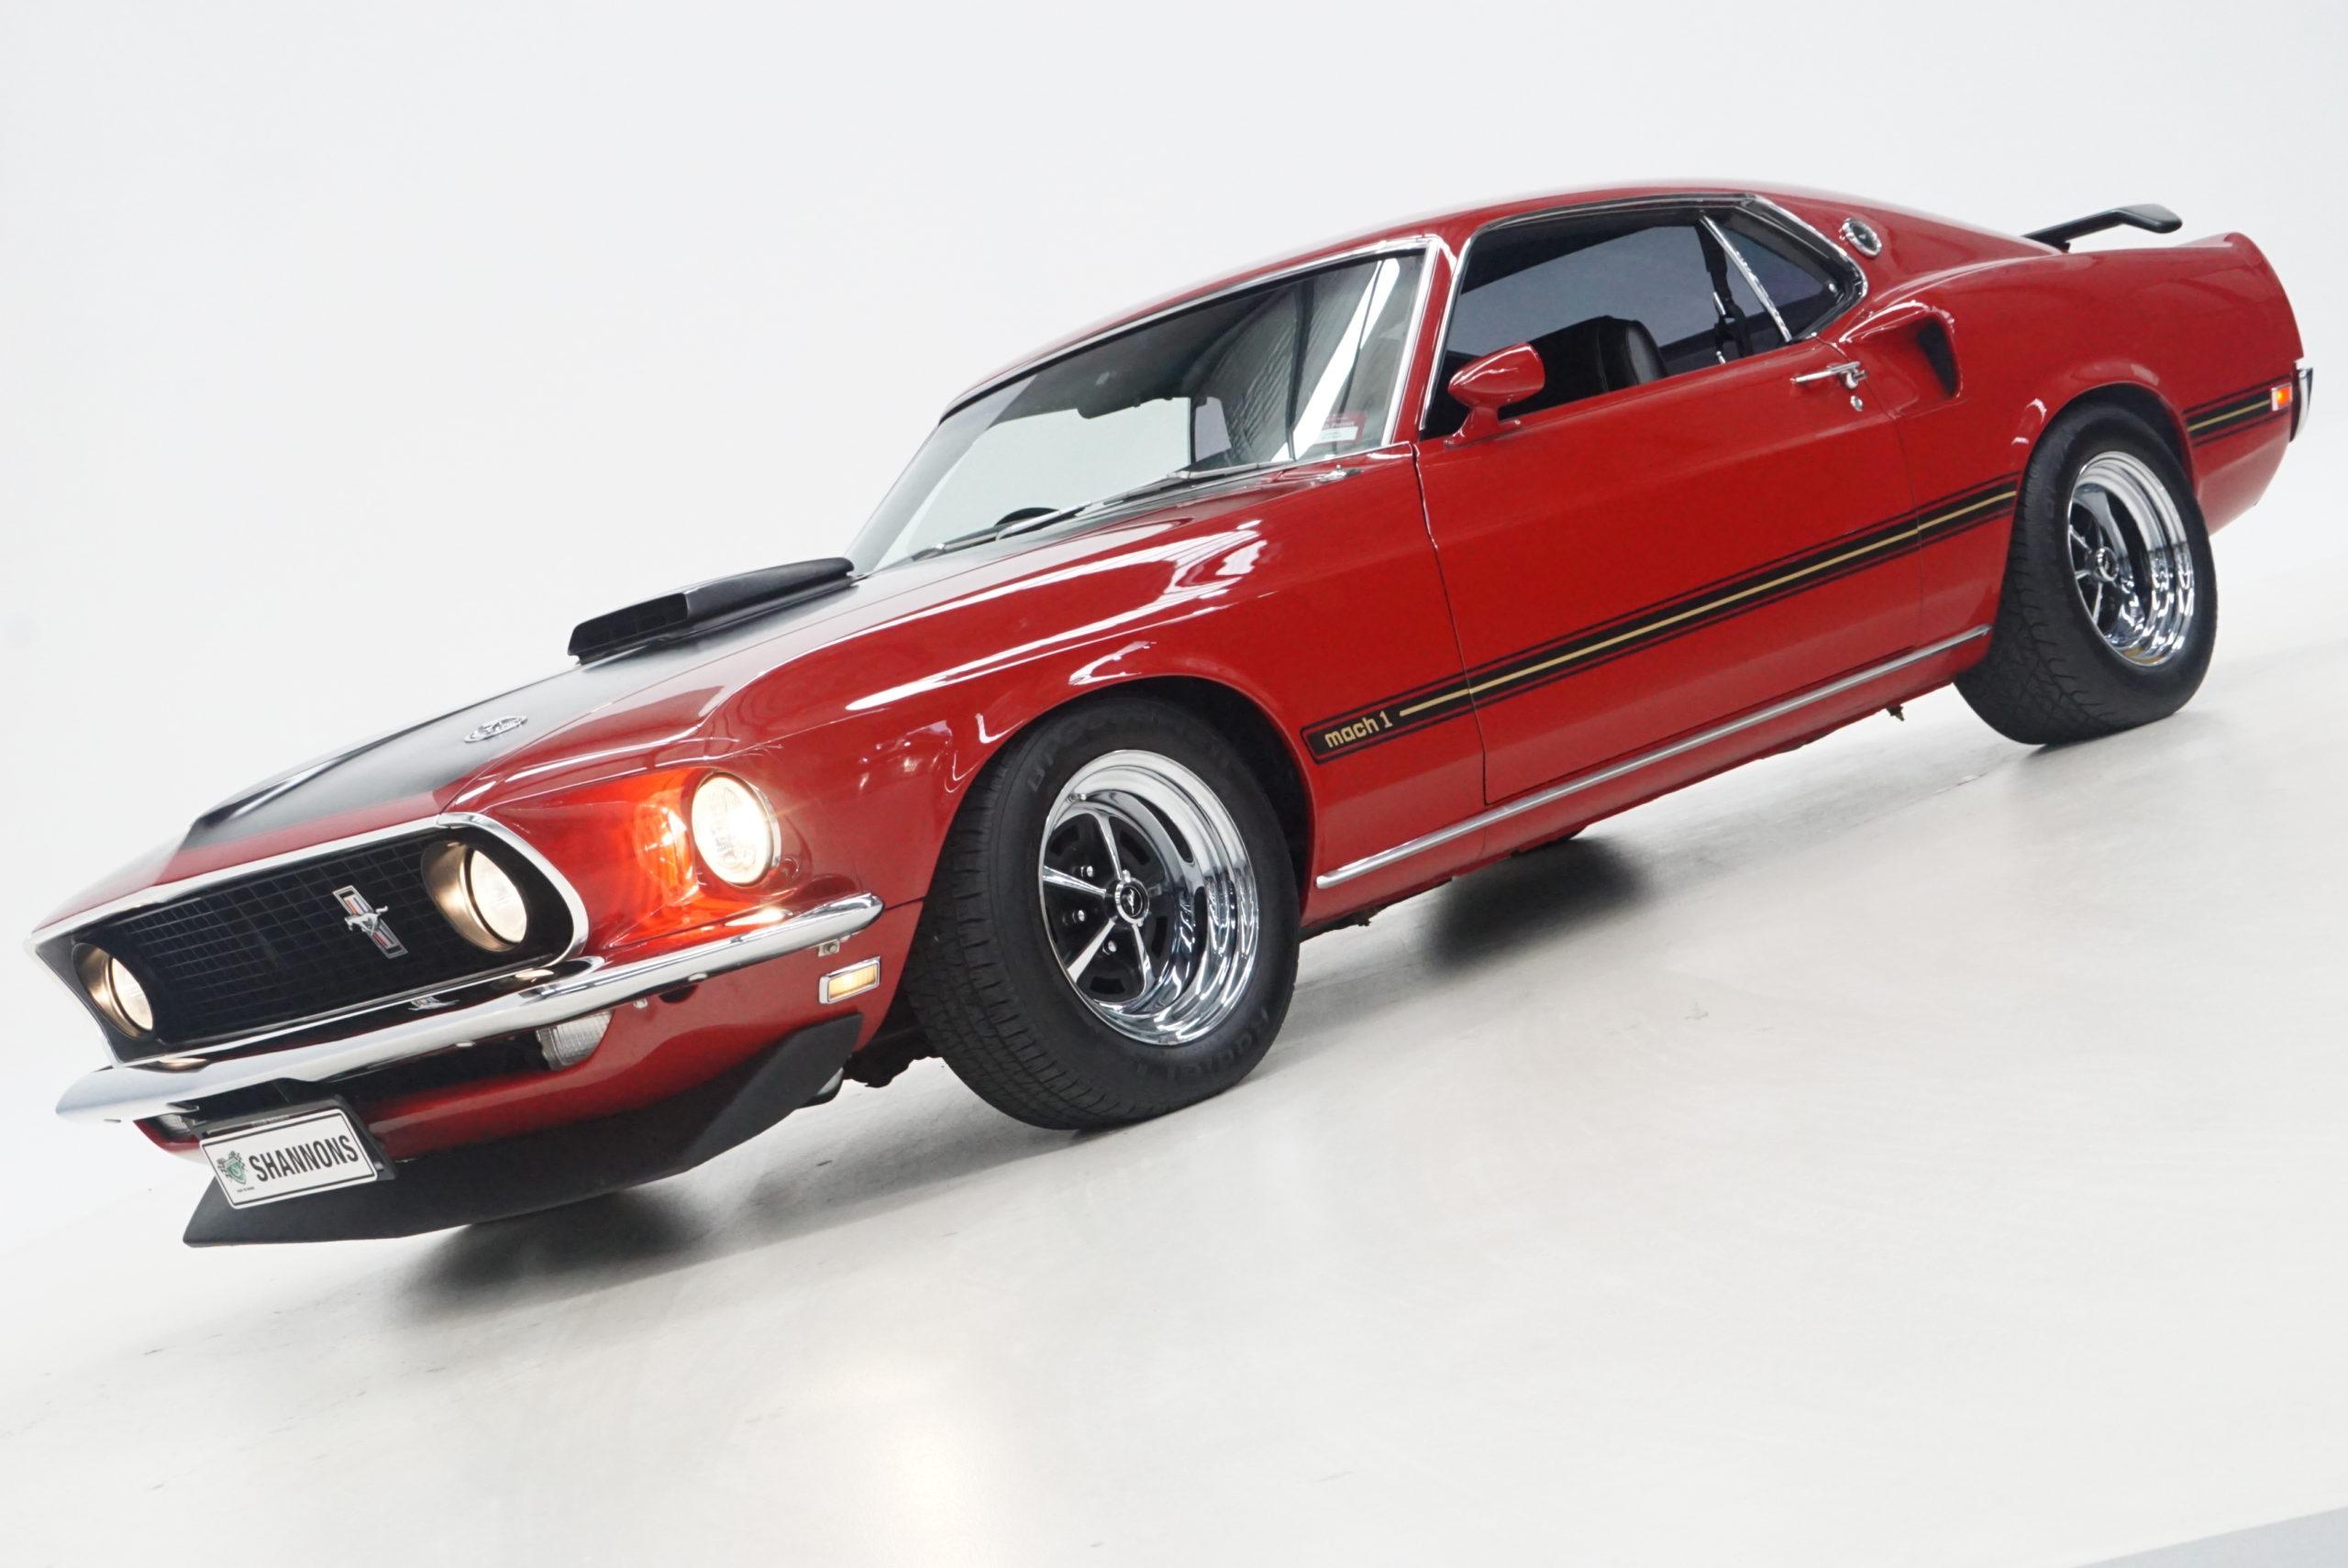 1969 Ford Mustang Mach 1 Fastback latéral trois quarts avant gauche phares allumés - Shannons Auctions avril 2021.